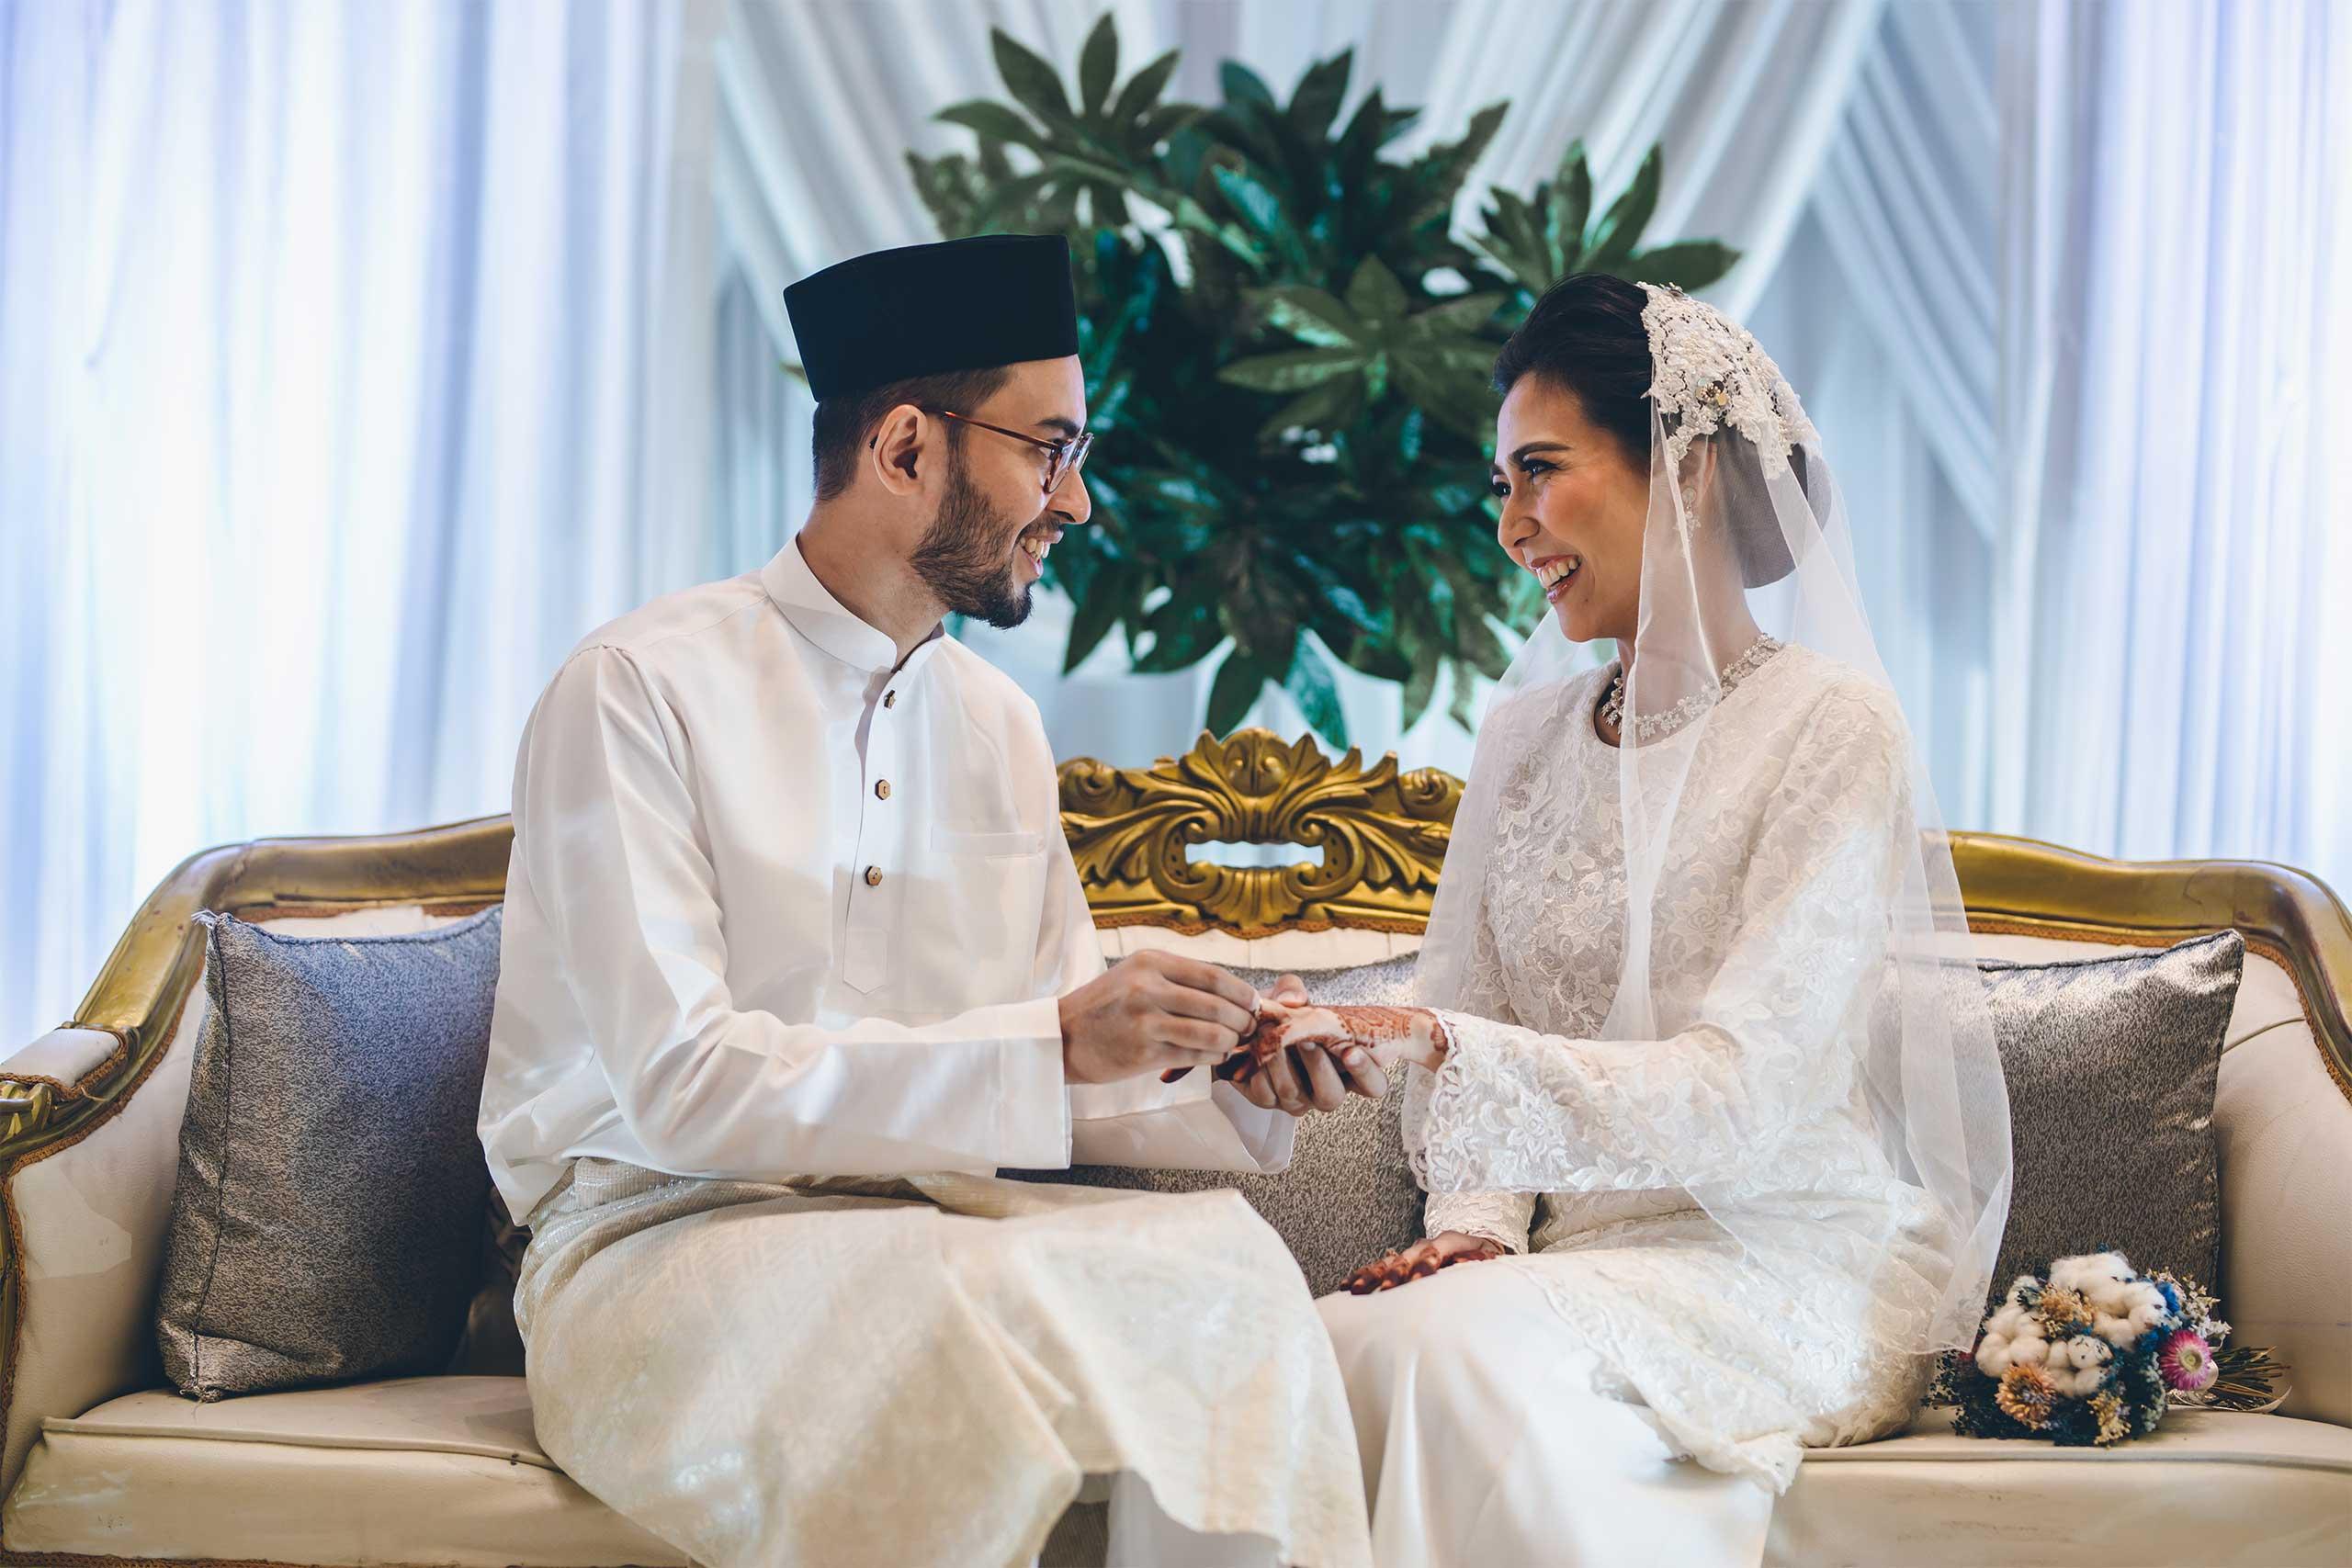 malay wedding videography Singapore